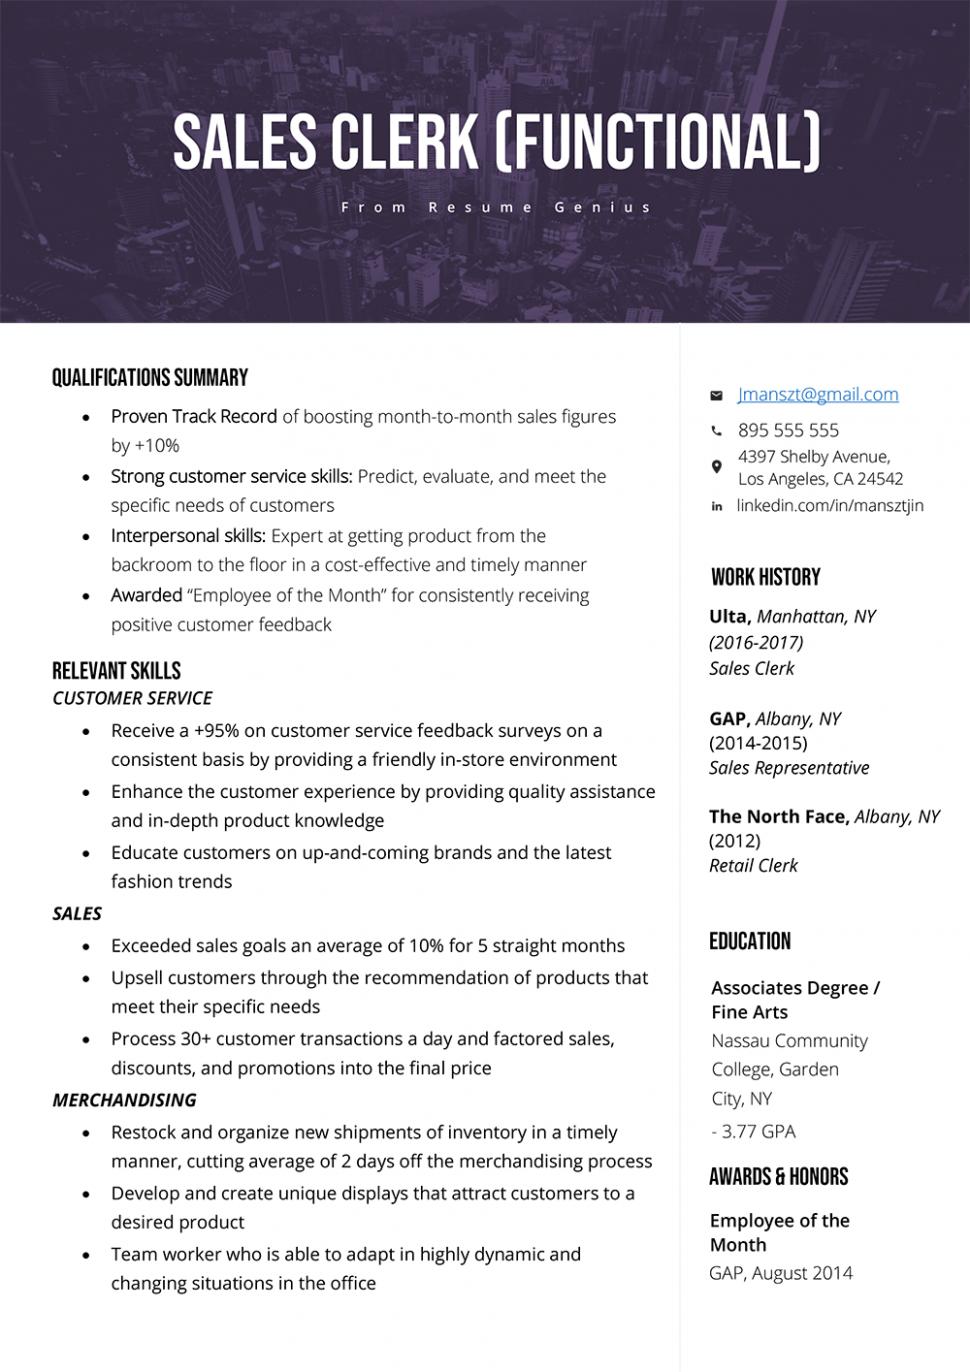 15 Fundamental Key Expertise For Resume In 2020 Resume Skills Resume Summary Examples Chronological Resume